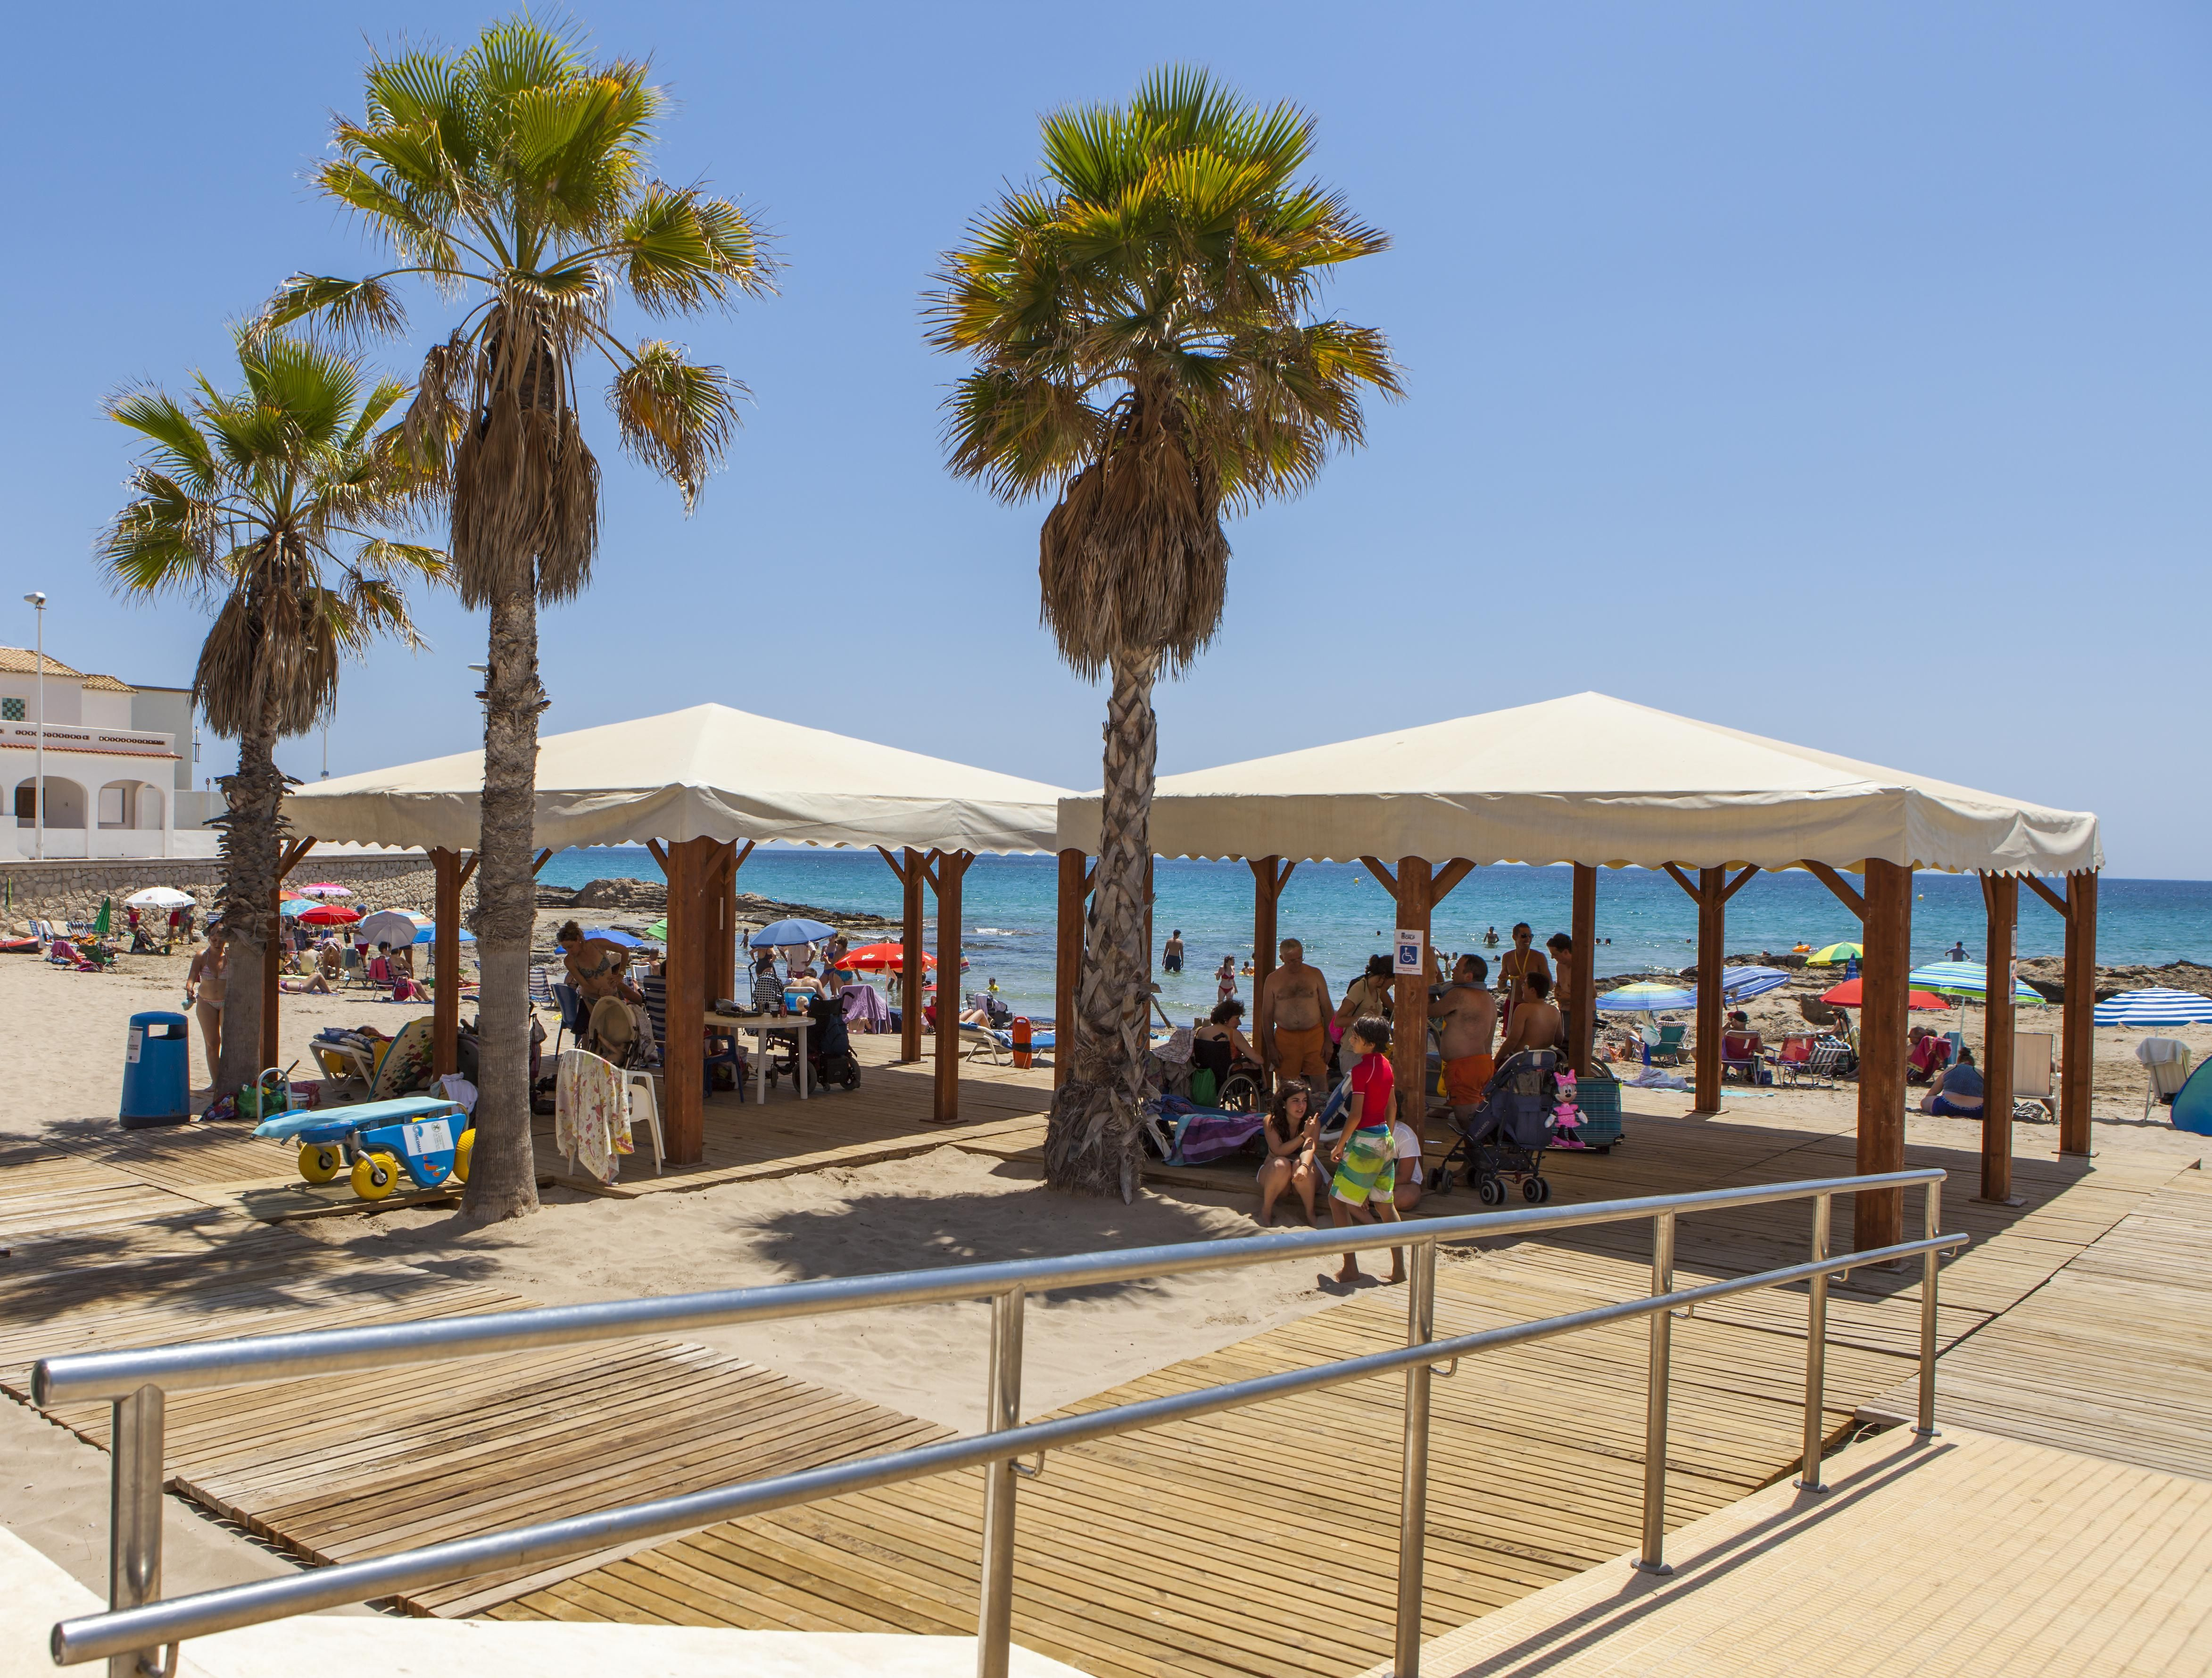 Playa accesible - C/ Italia #Calpe #Calp